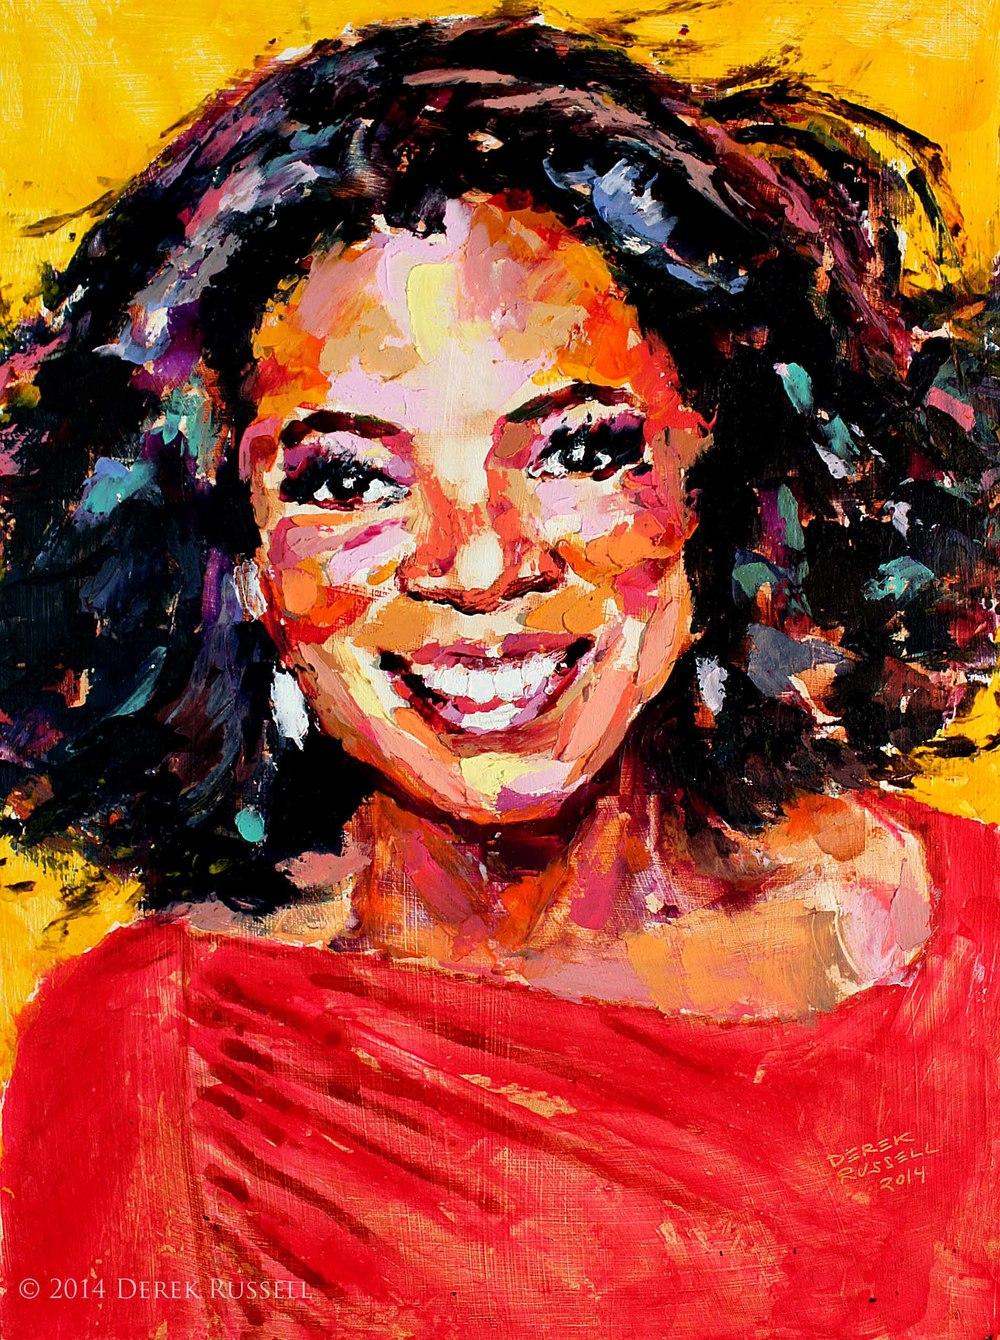 Oprah Winfrey Original Acrylic & Oil Portrait Painting by Artist Derek Russell 2014 Copyright.jpg